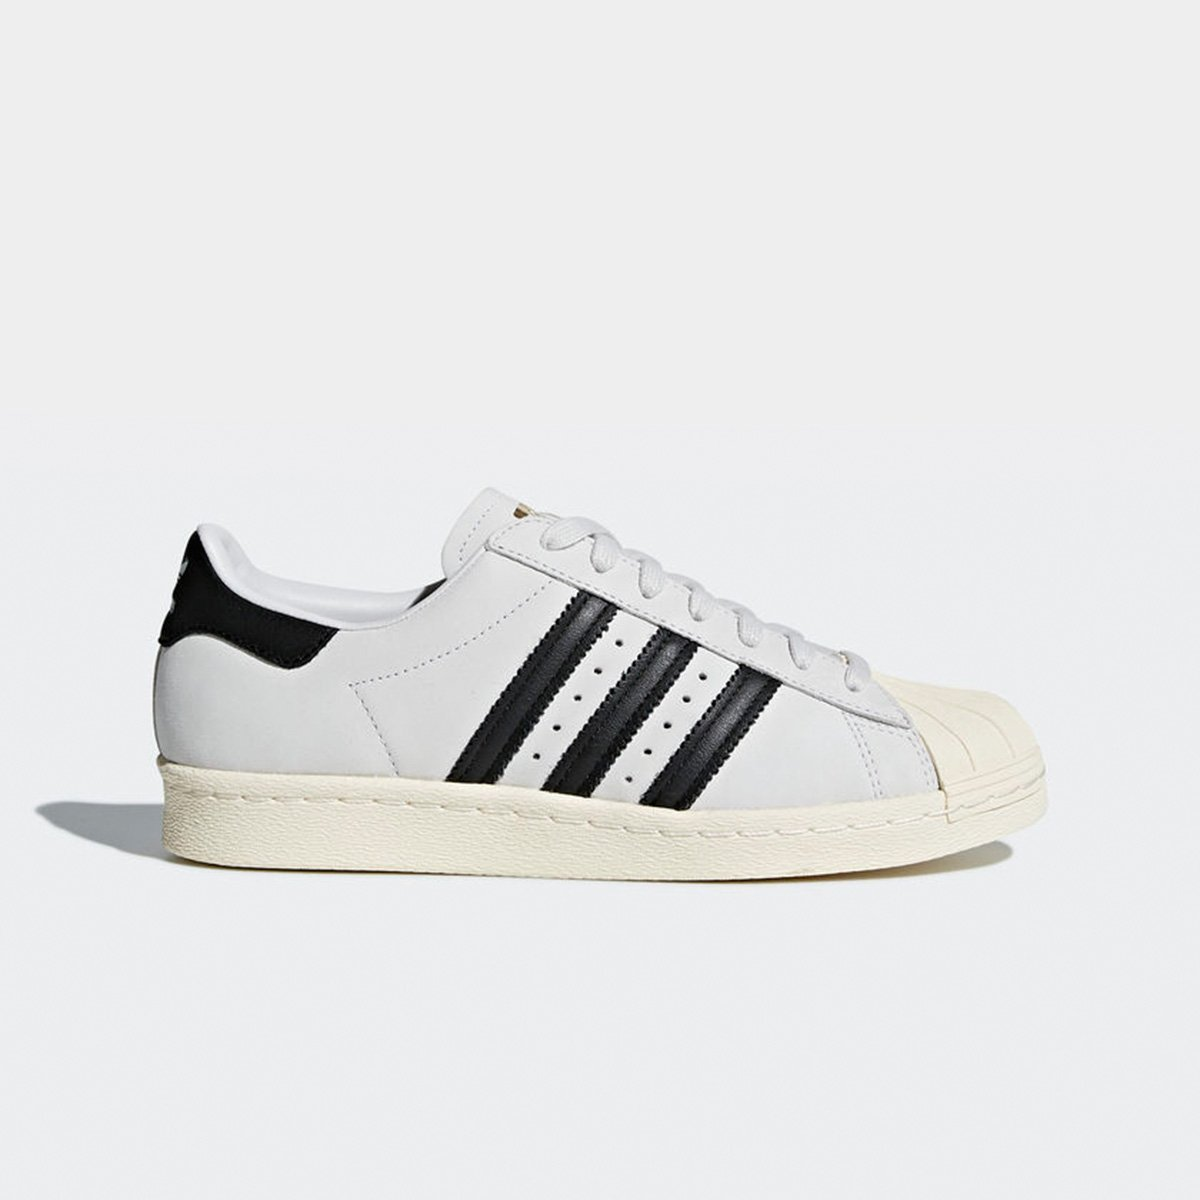 67009f63eeb Tênis Adidas Superstar Feminino Preto e Branco